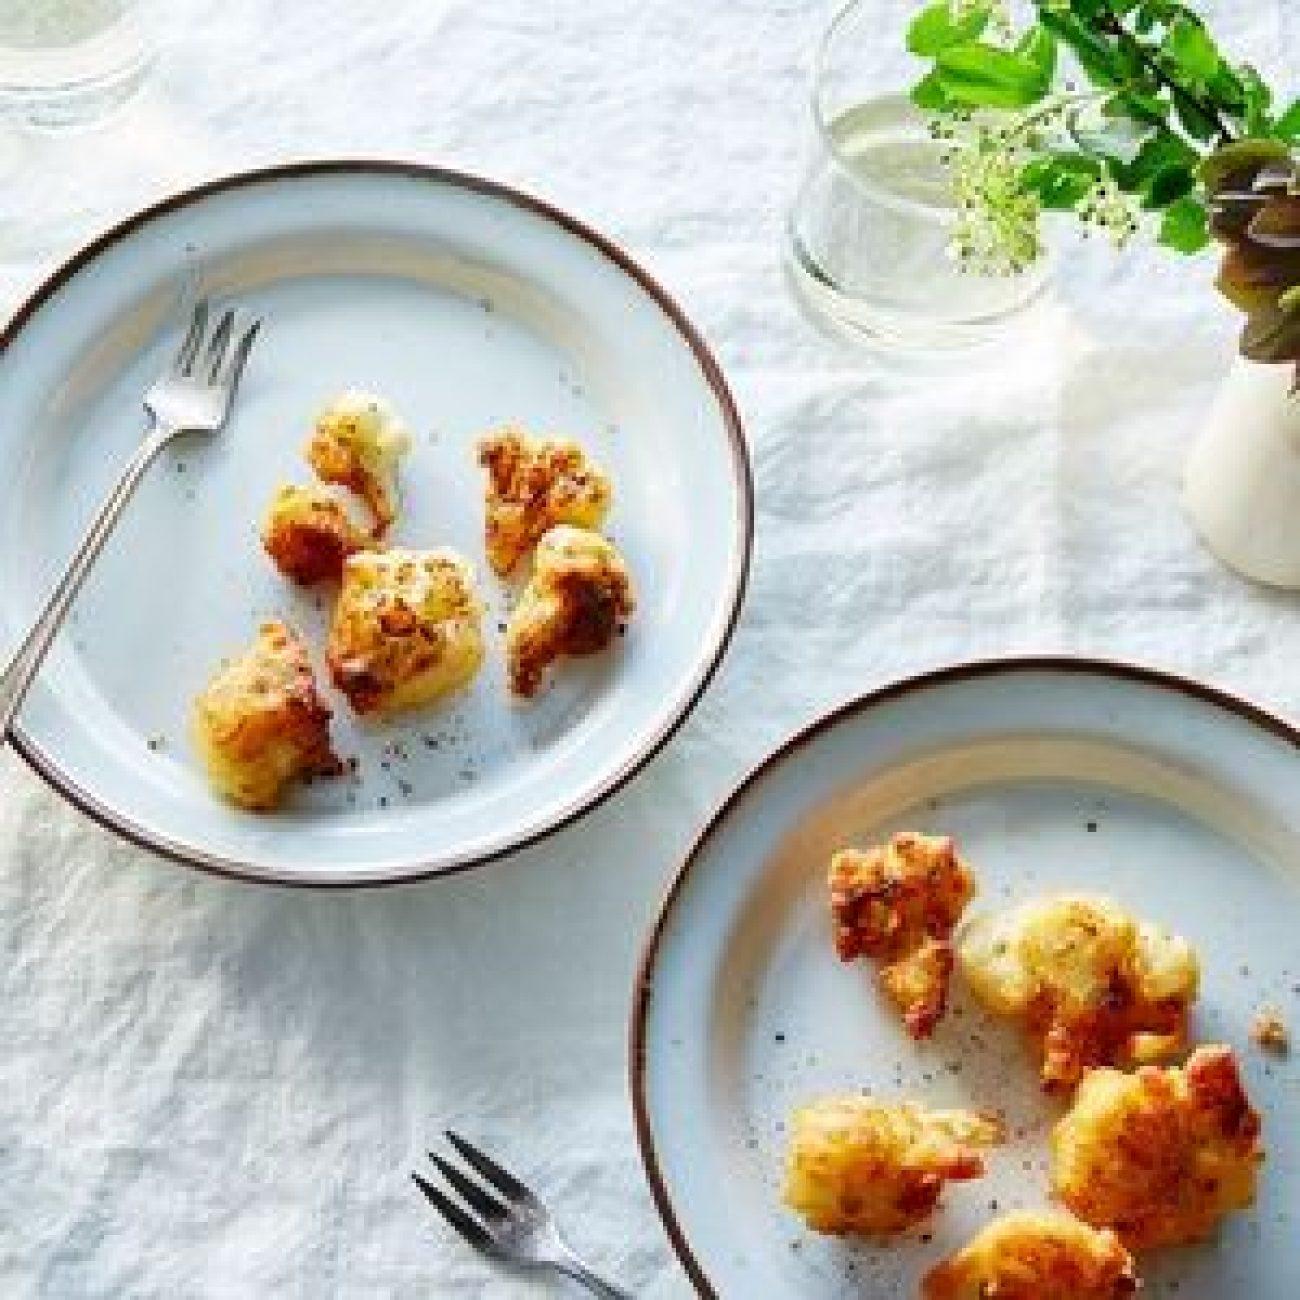 Fried Cauliflower in Parmesan Batter